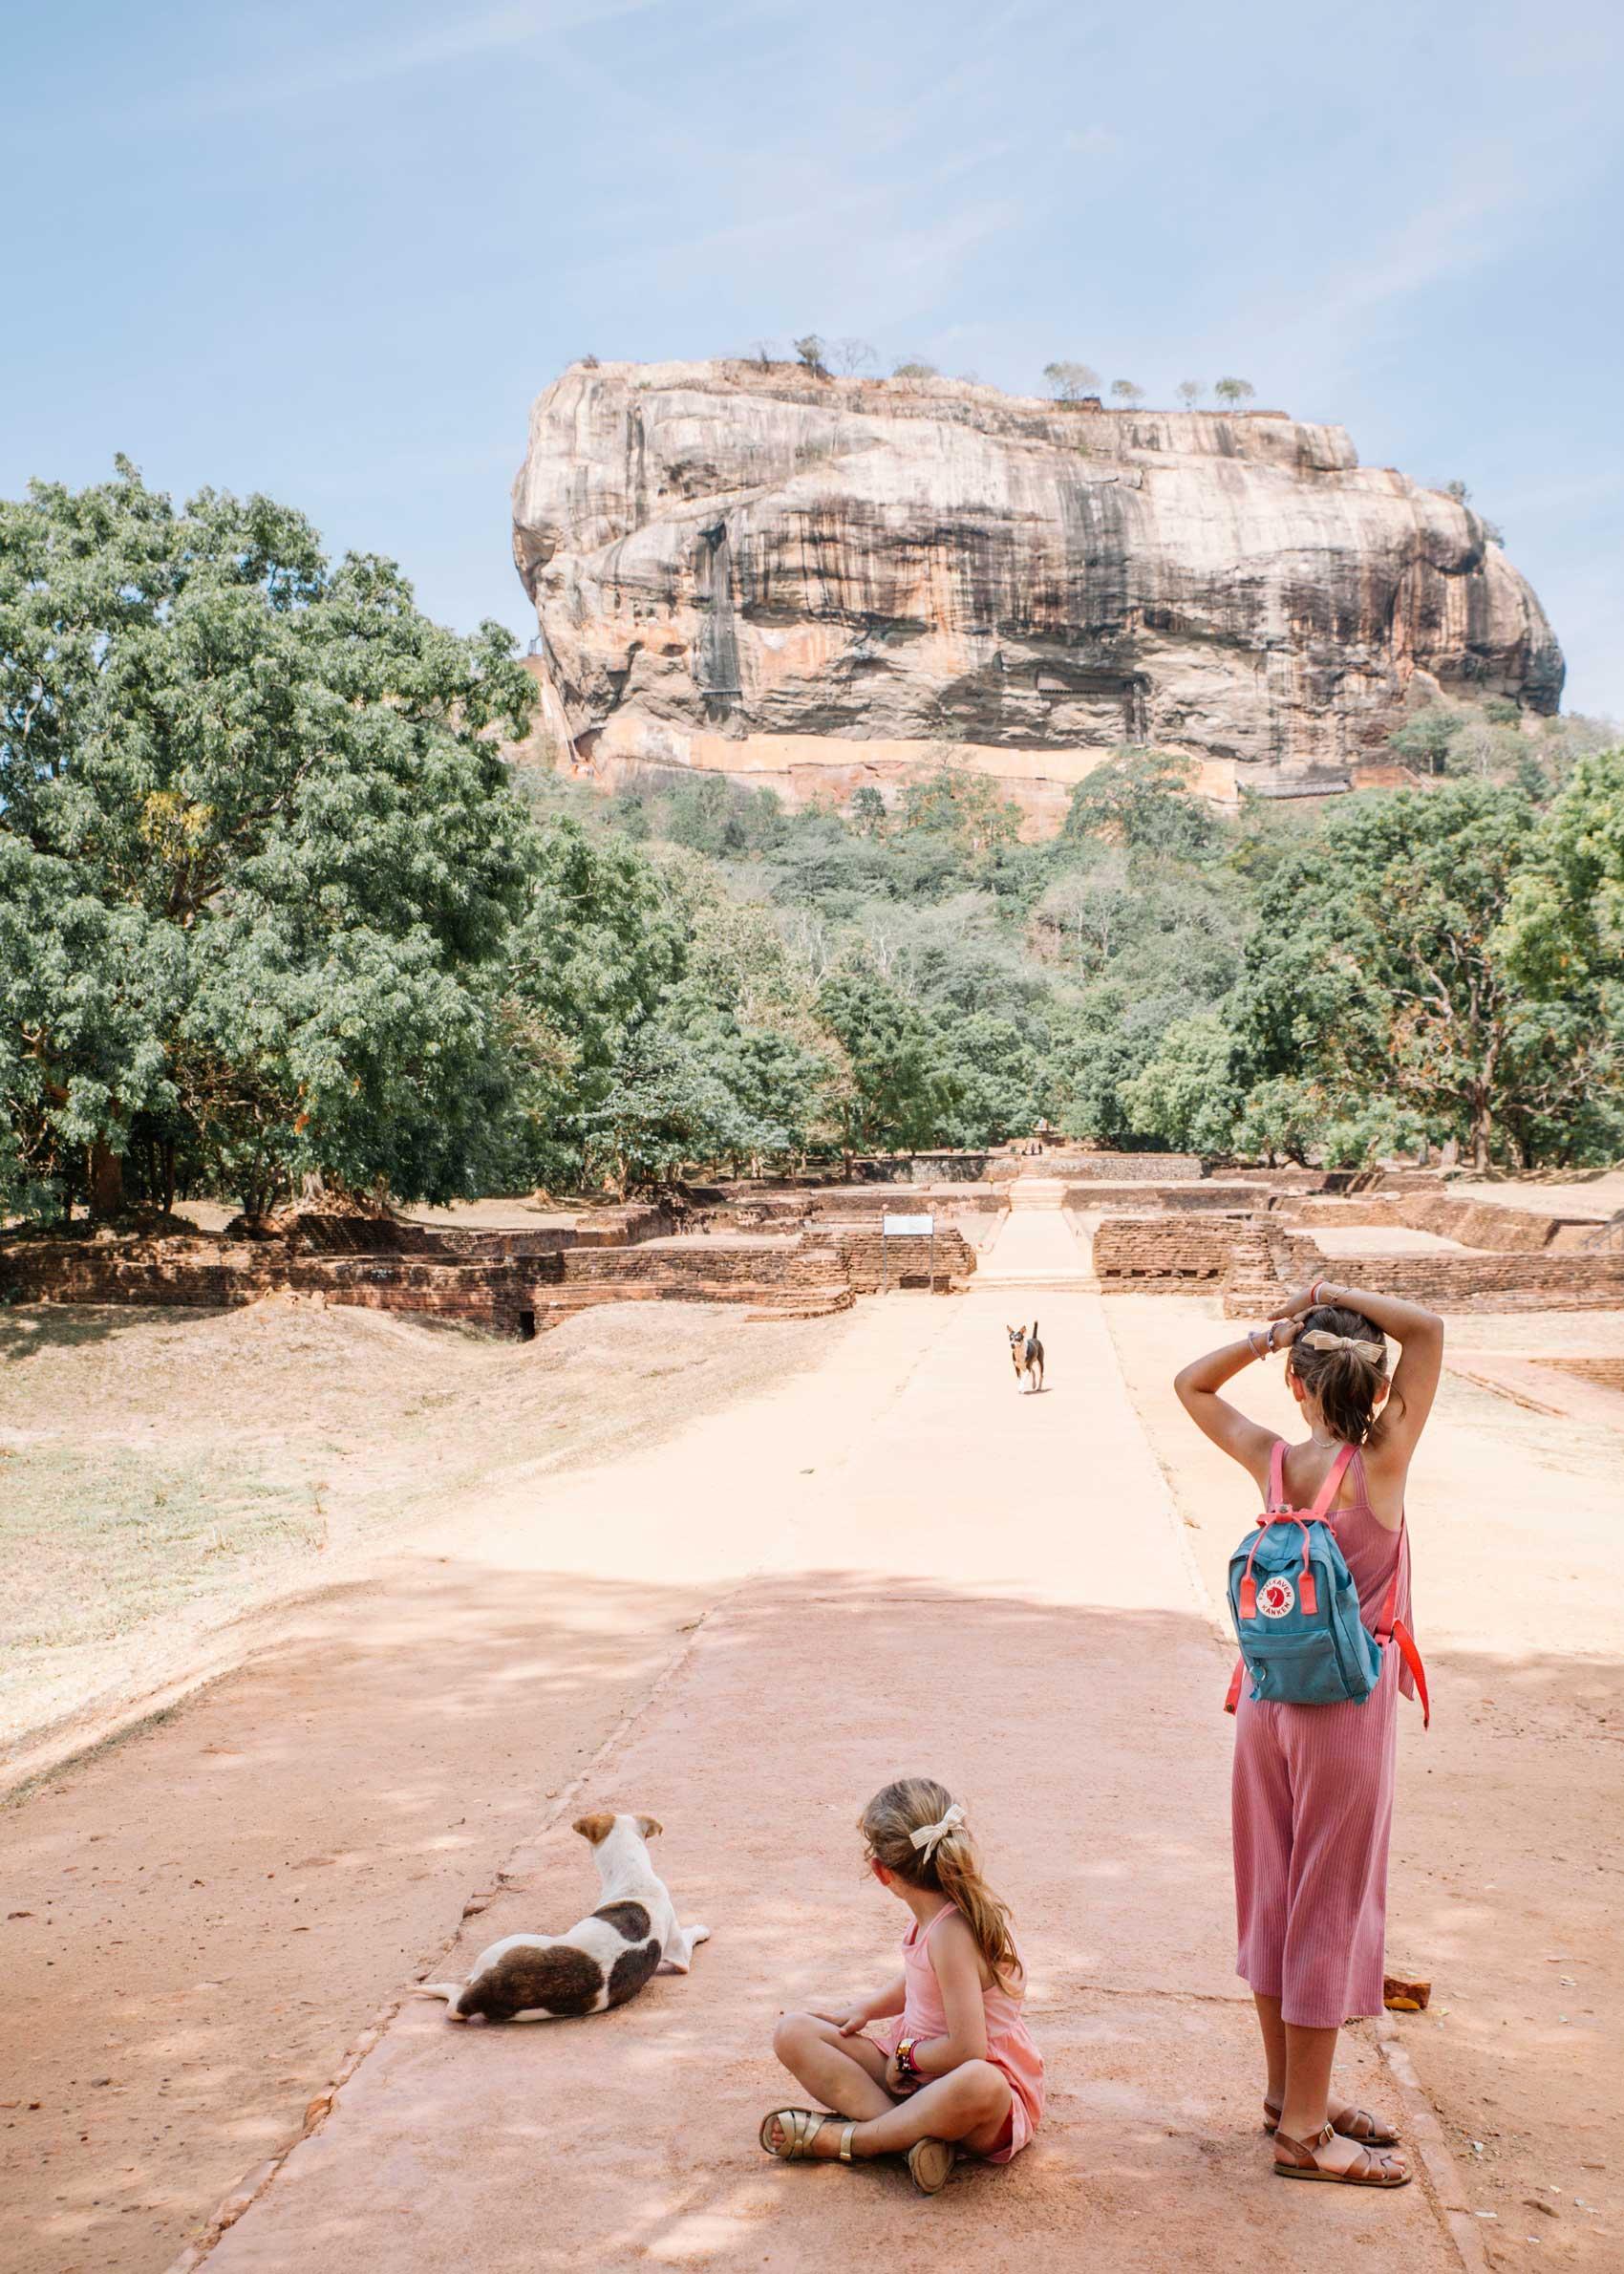 Itinerario de viaje a Sri Lanka con niños